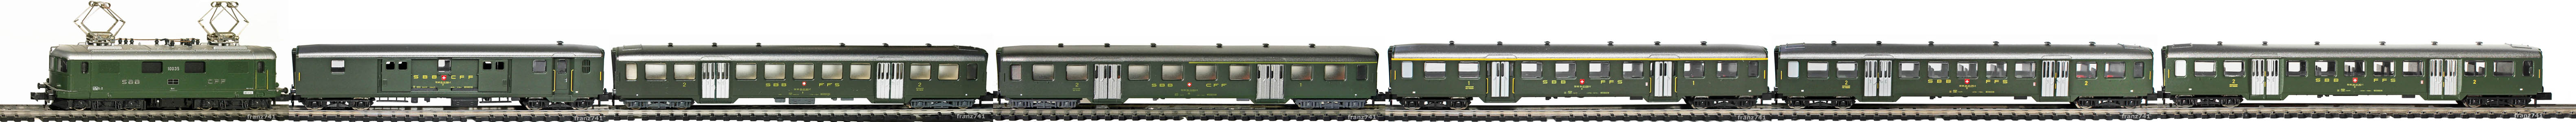 Epoche-IV-SBB-Personenzug_Re-4-4-I-Elok-Leichtstahlwagen-AR-HN